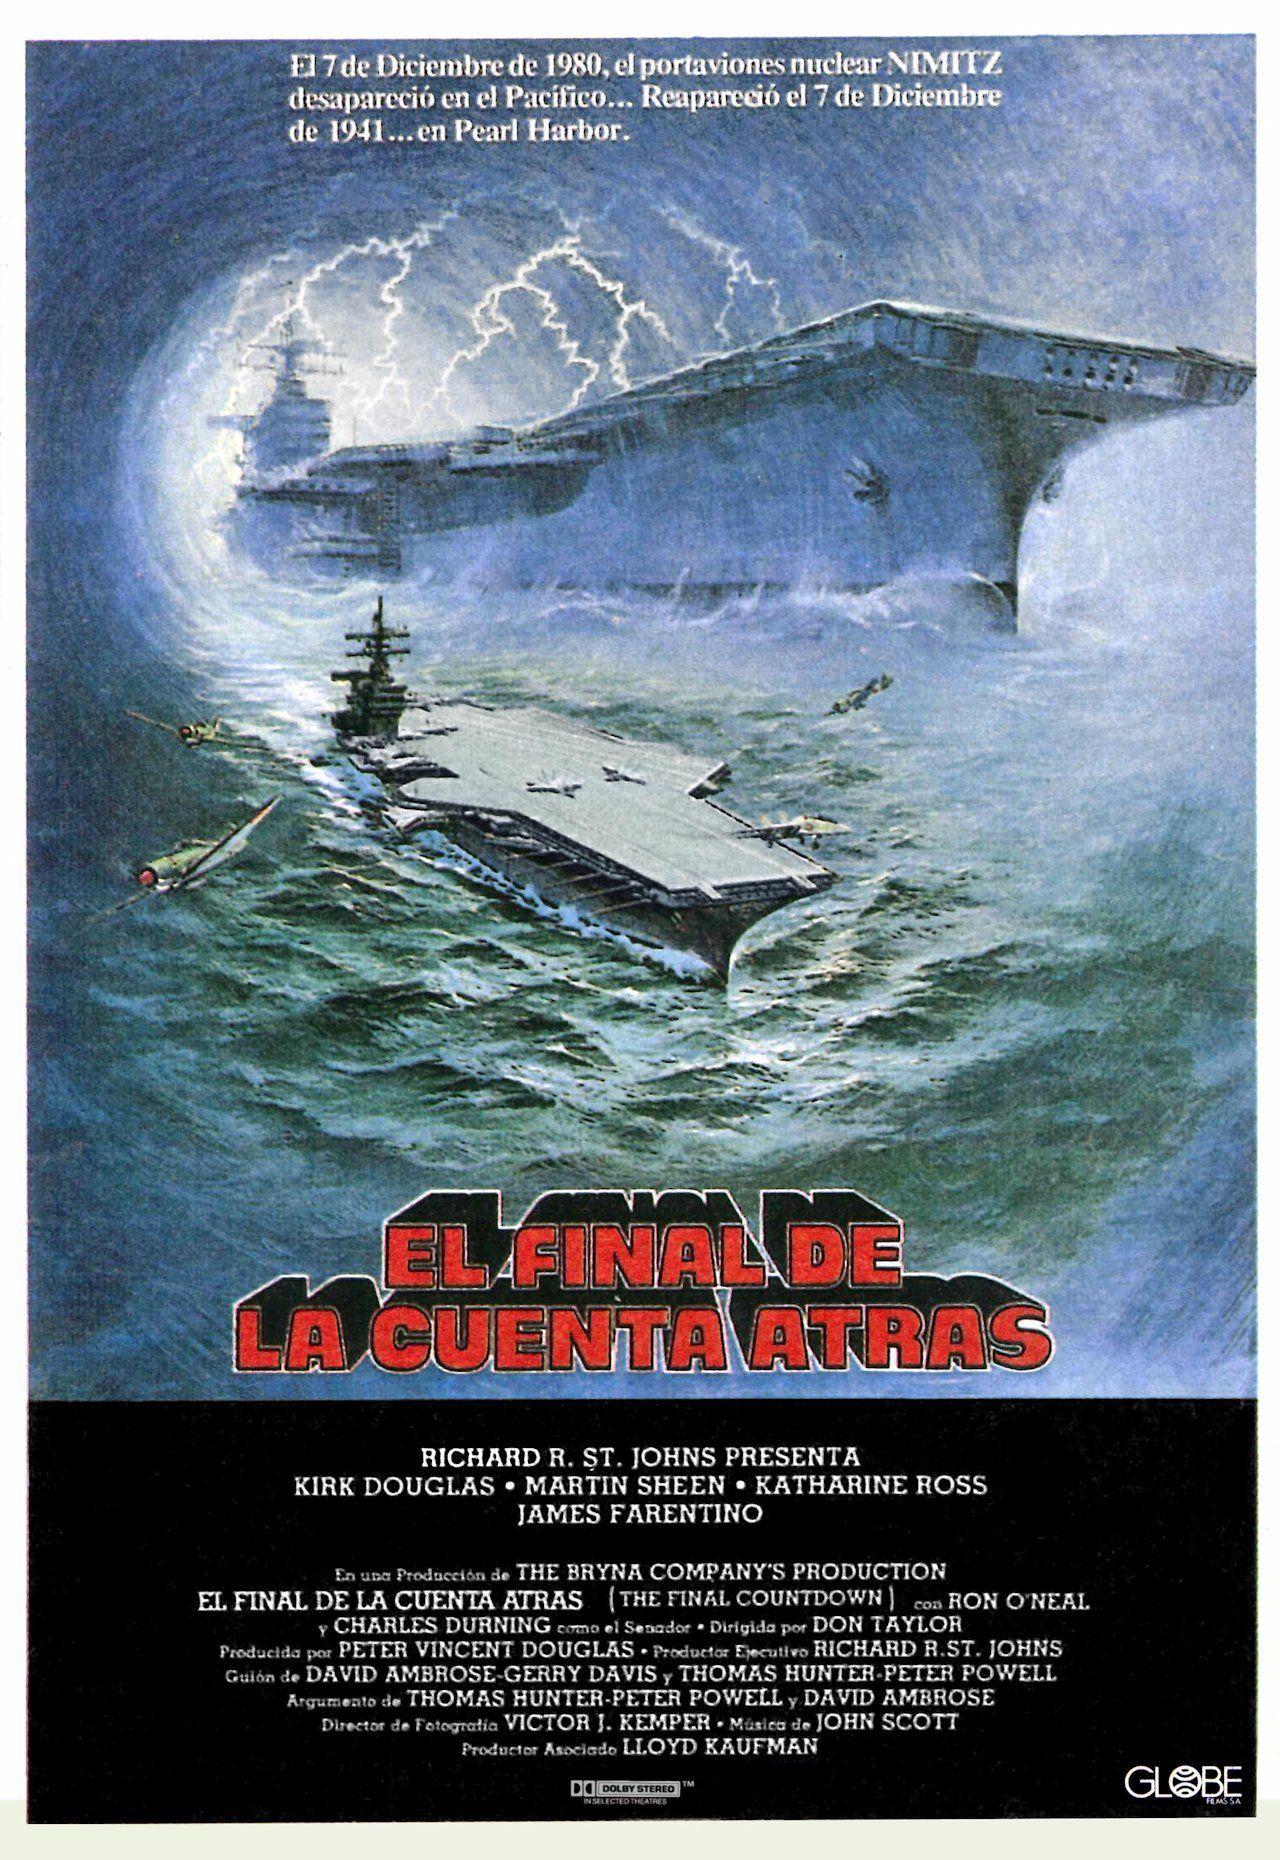 The Final Countdown Spanish Poster Peliculas De Aviones Cine Carteleras De Cine